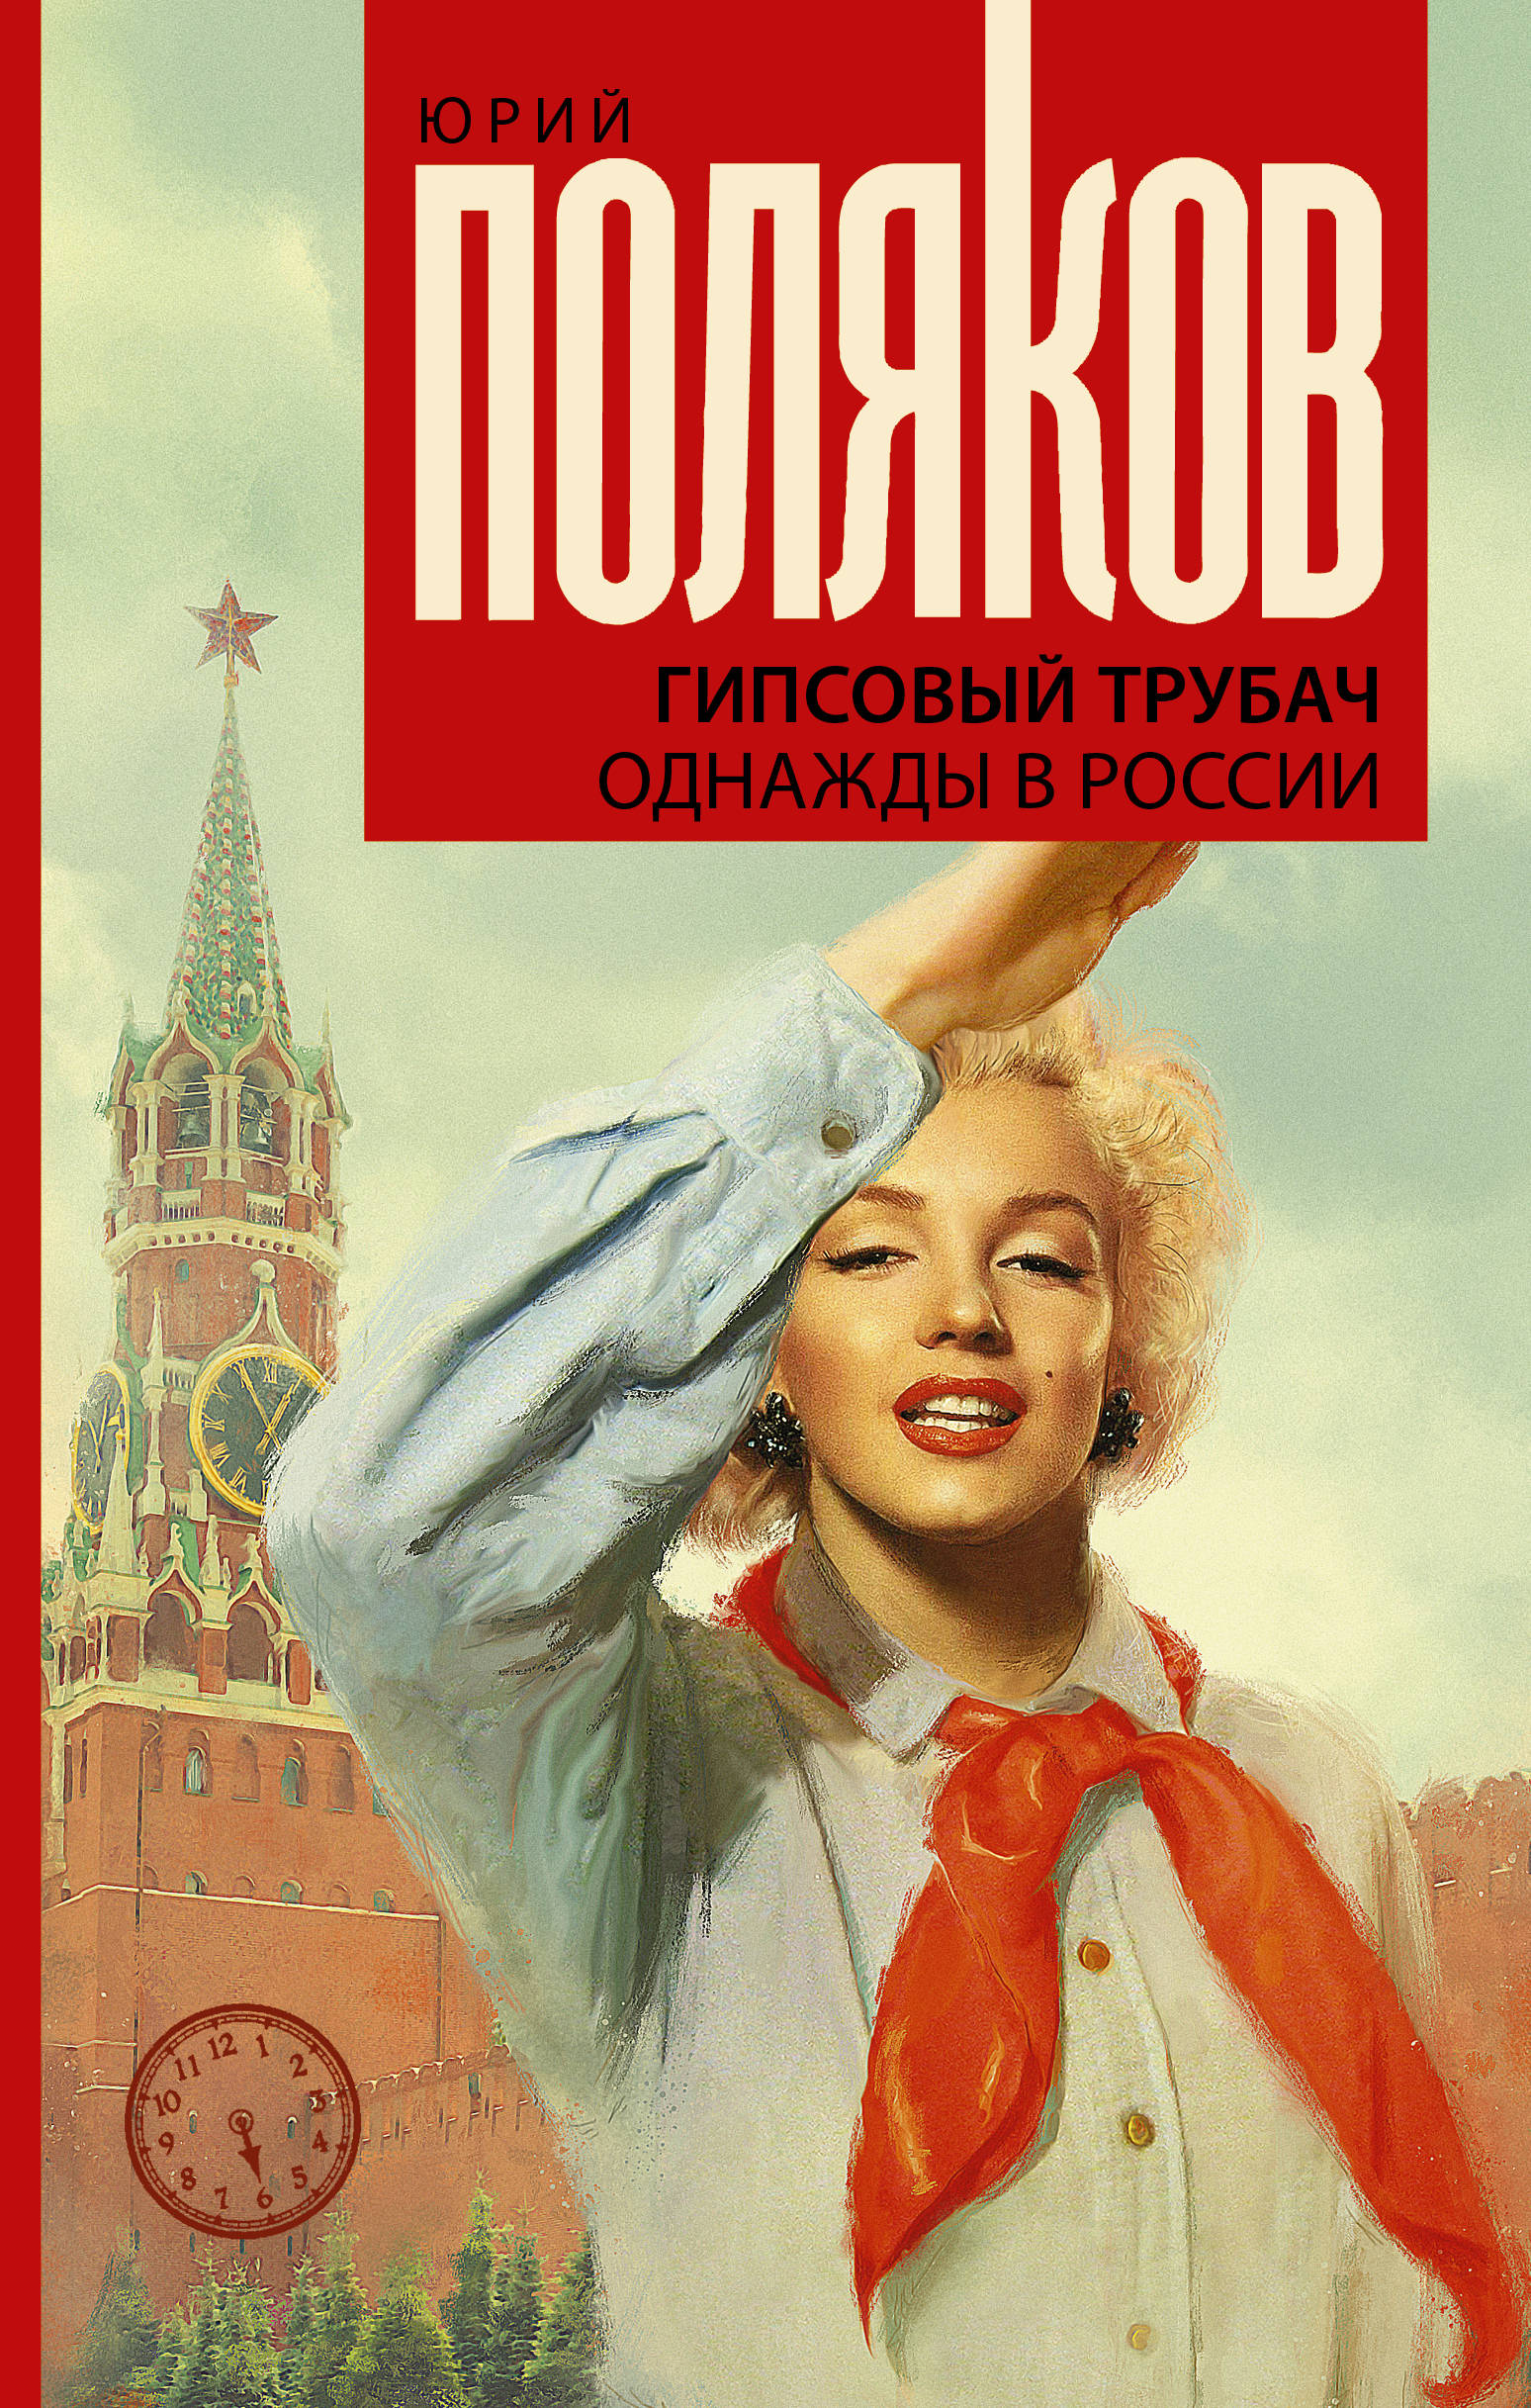 Gipsovyj trubach. Odnazhdy v Rossii